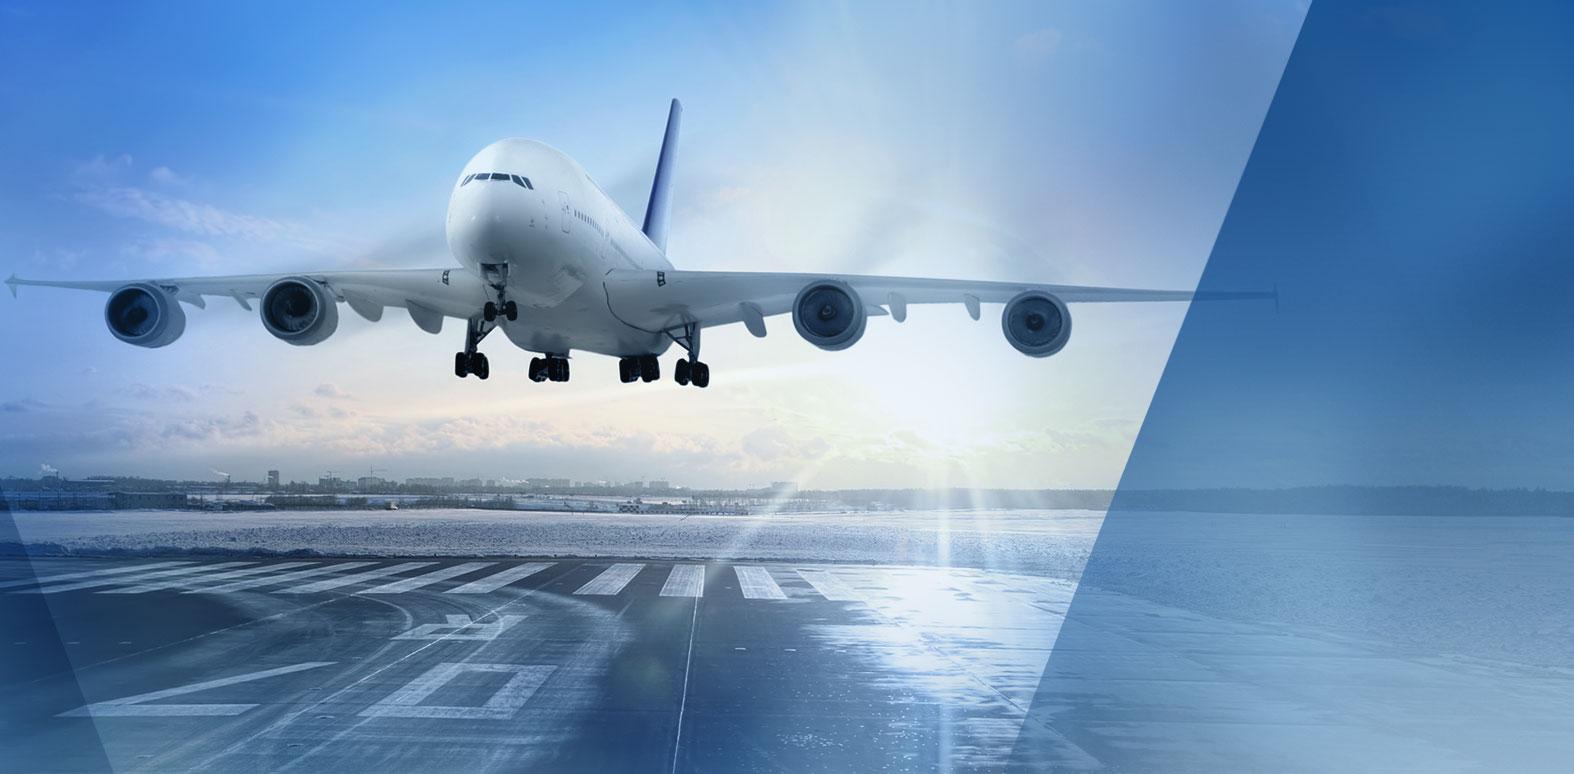 Luftfahrtindustrie